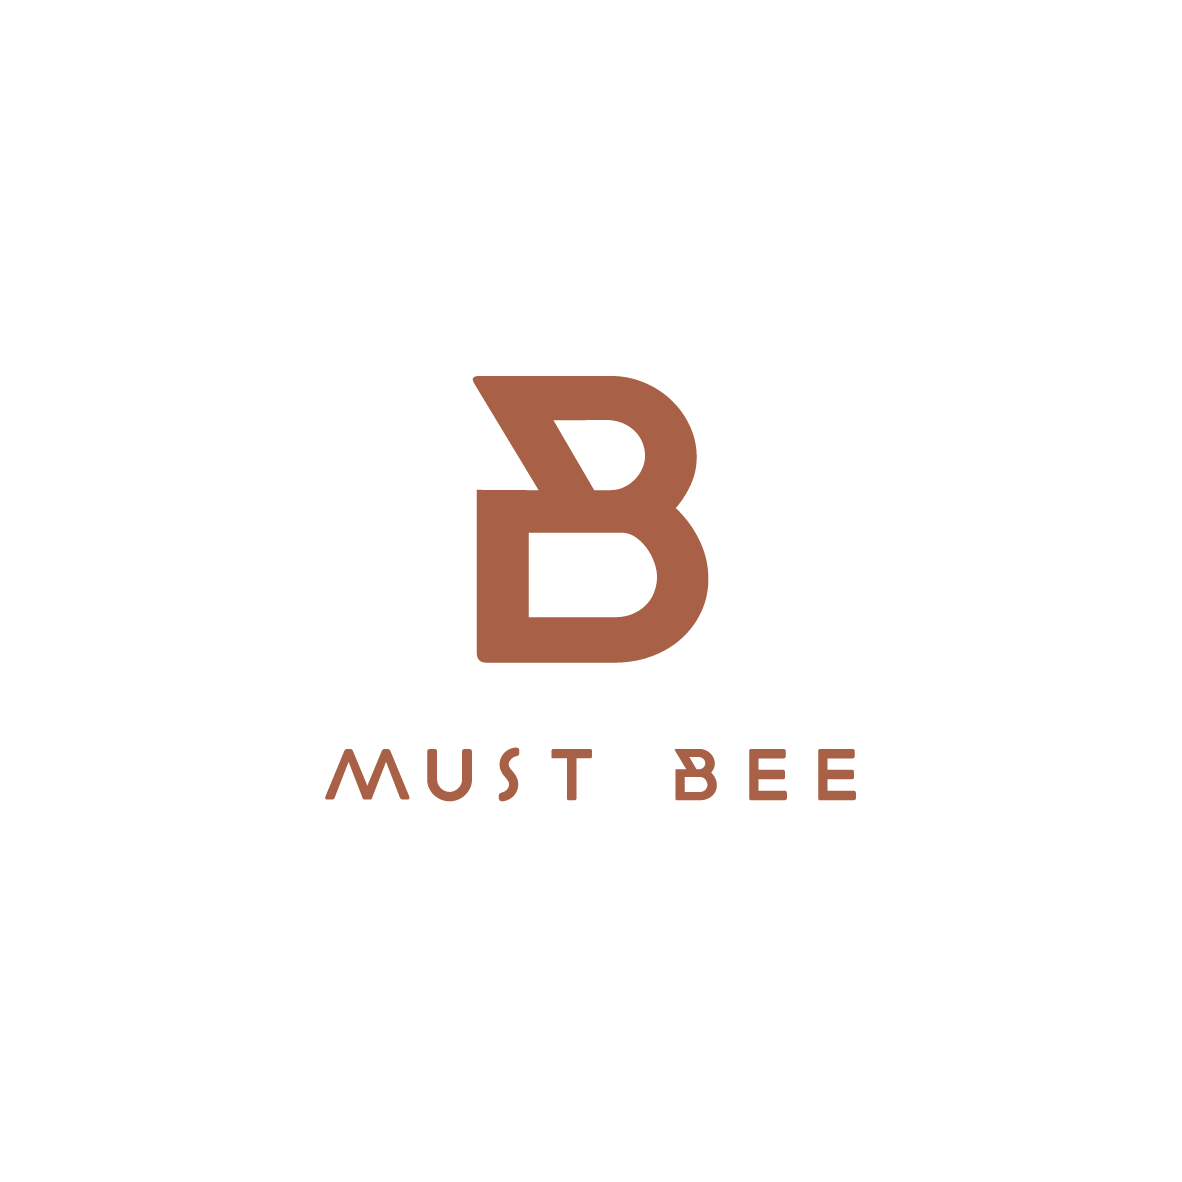 Must Bee LOGO 2020 09 23 01